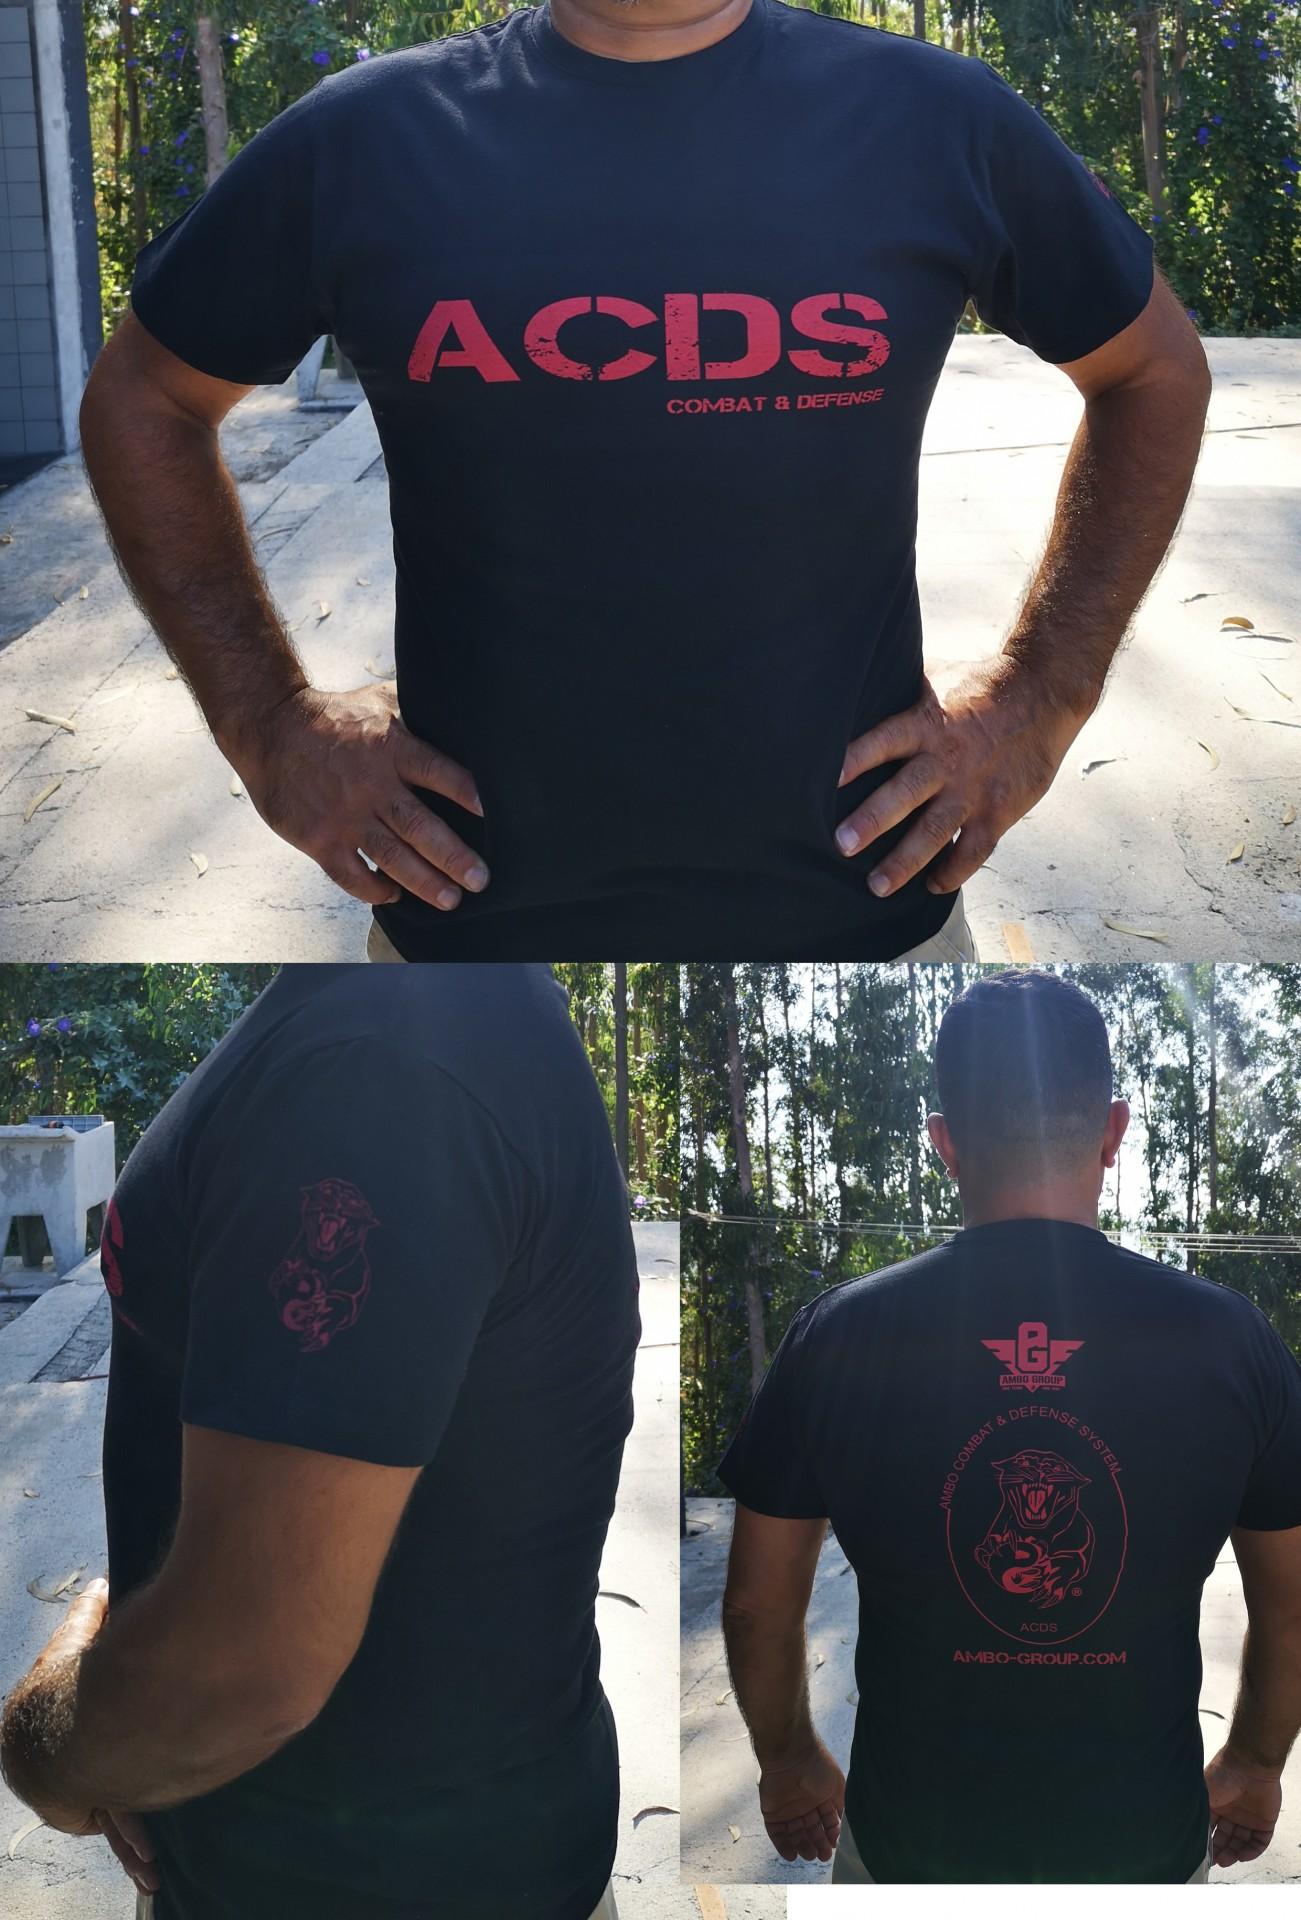 T-Shirt ACDS Ambo Combat